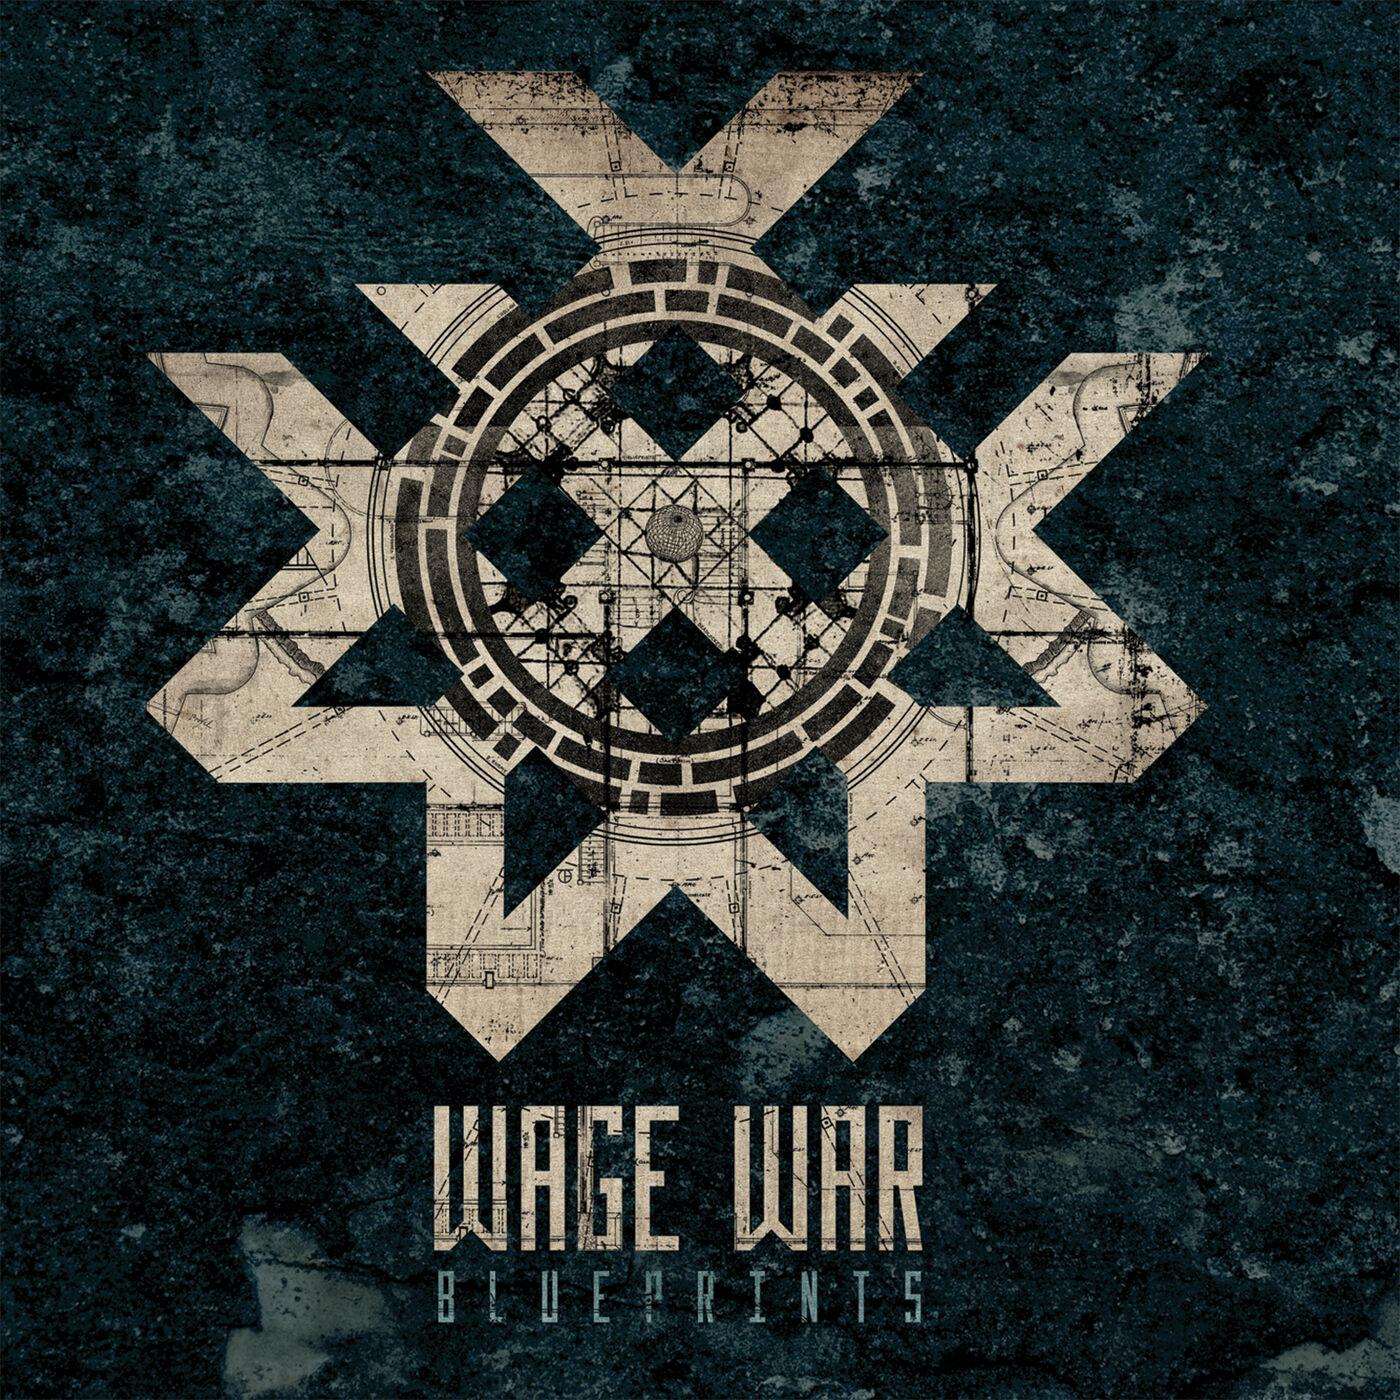 Wage war blueprints 2015 core radio wage war blueprints 2015 malvernweather Choice Image